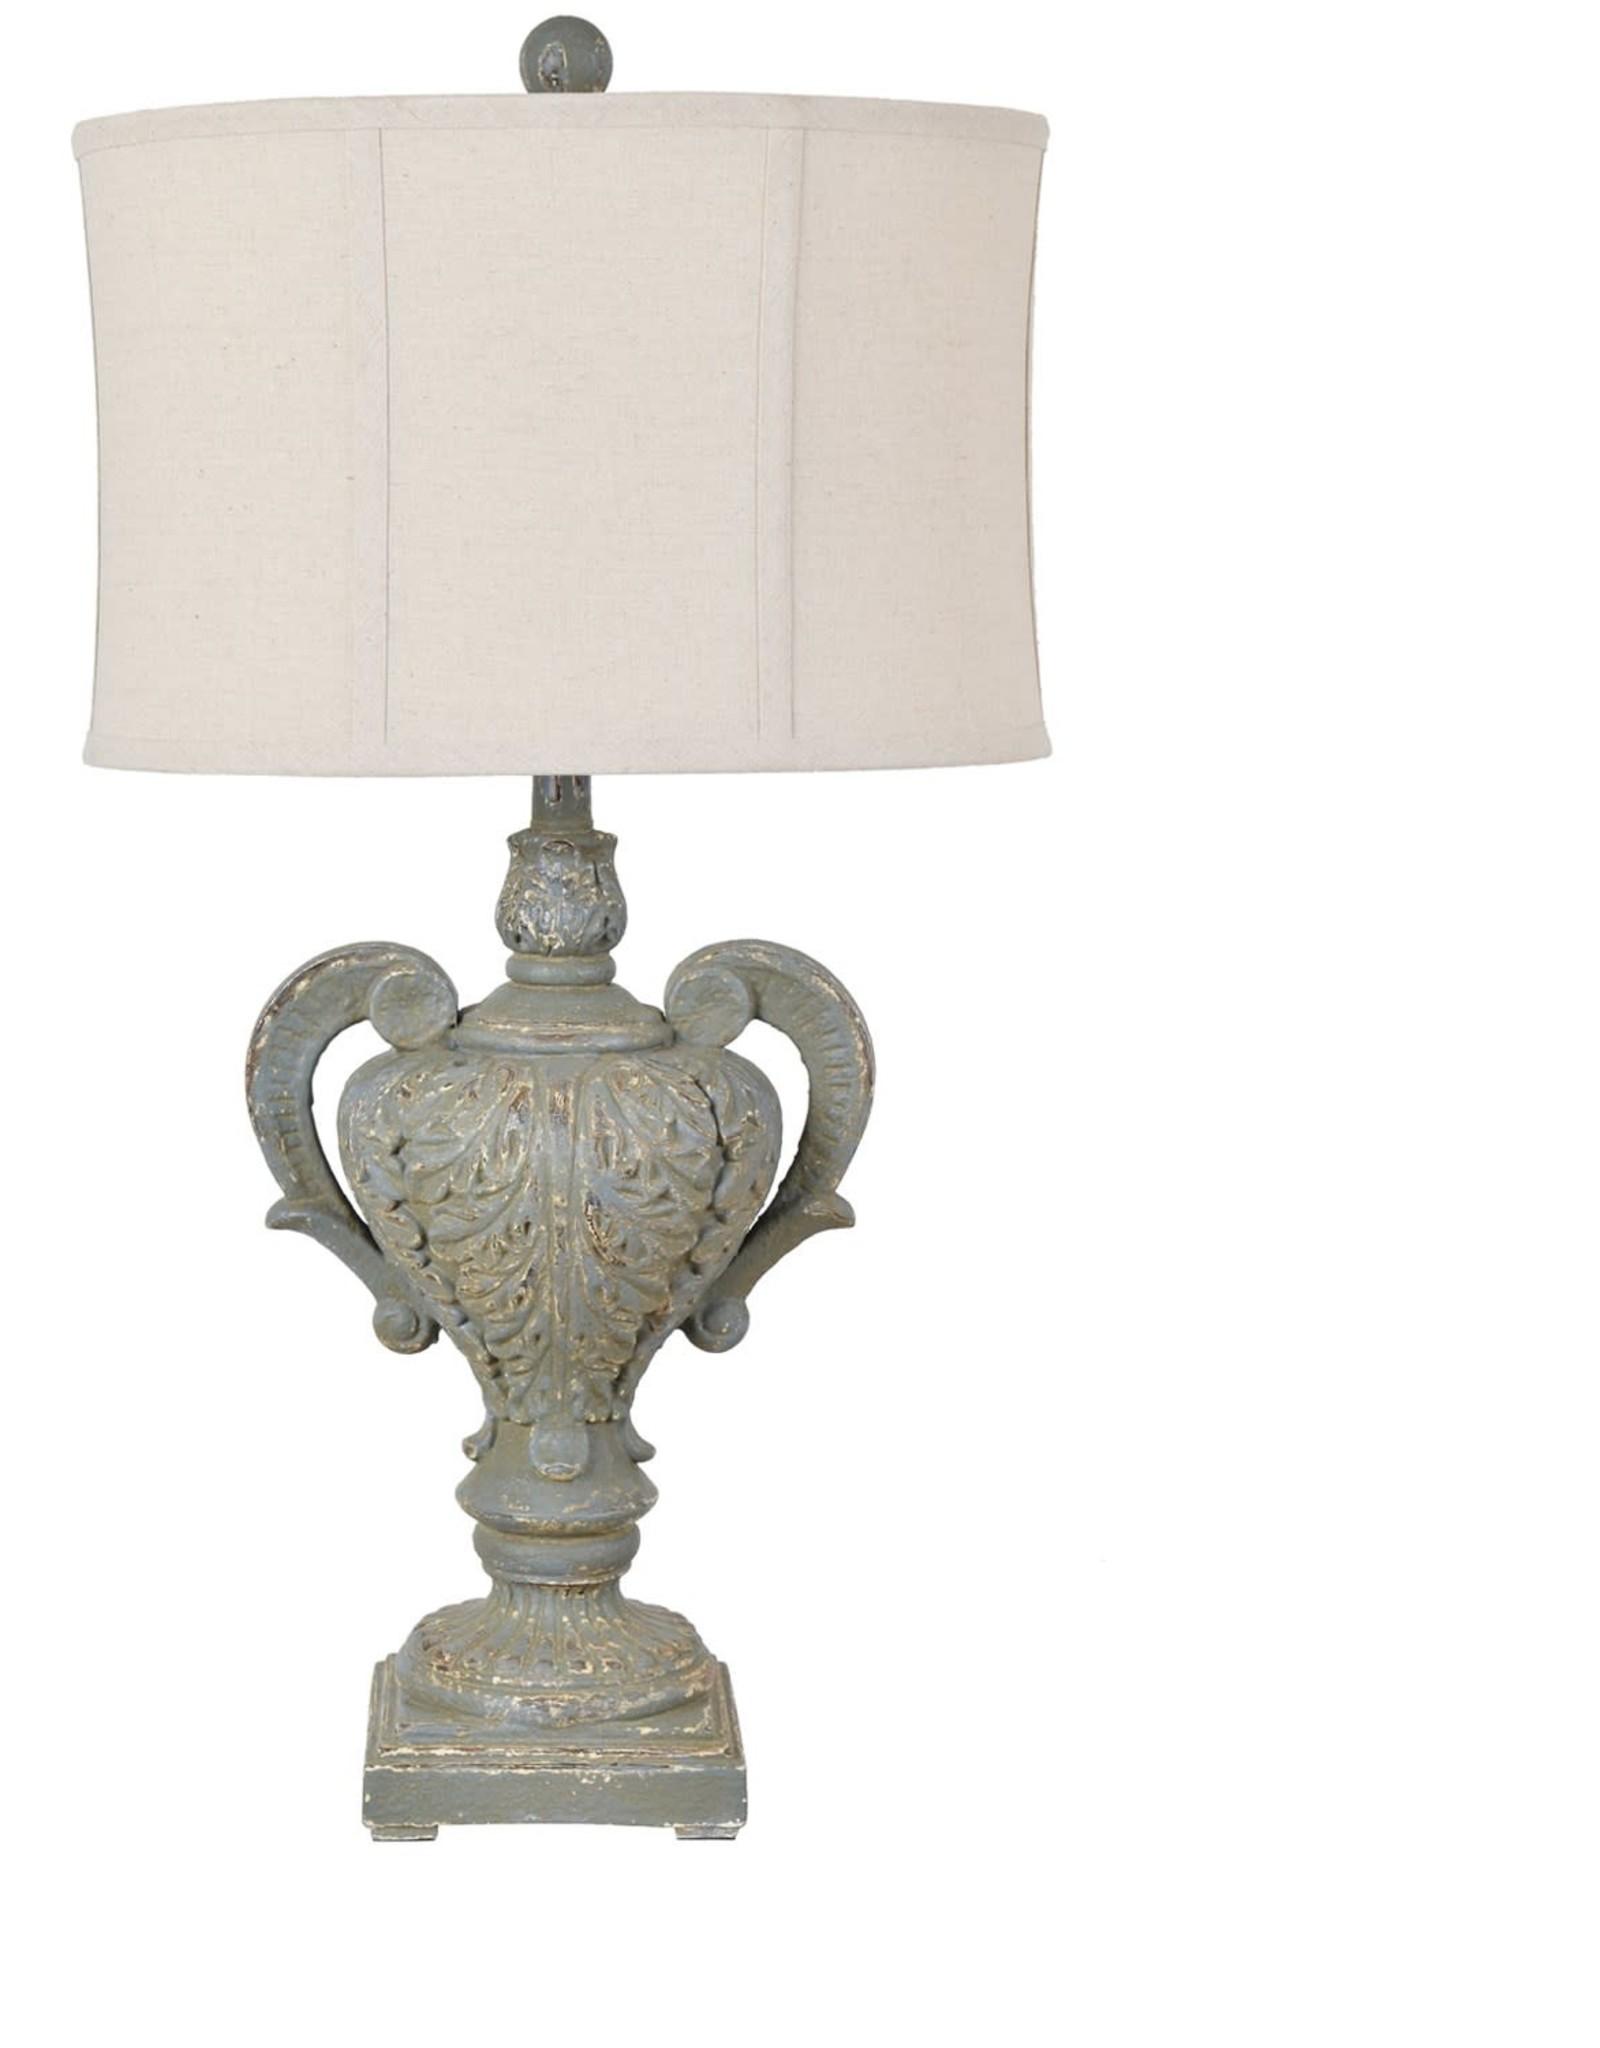 Crestview Calico Table Lamp